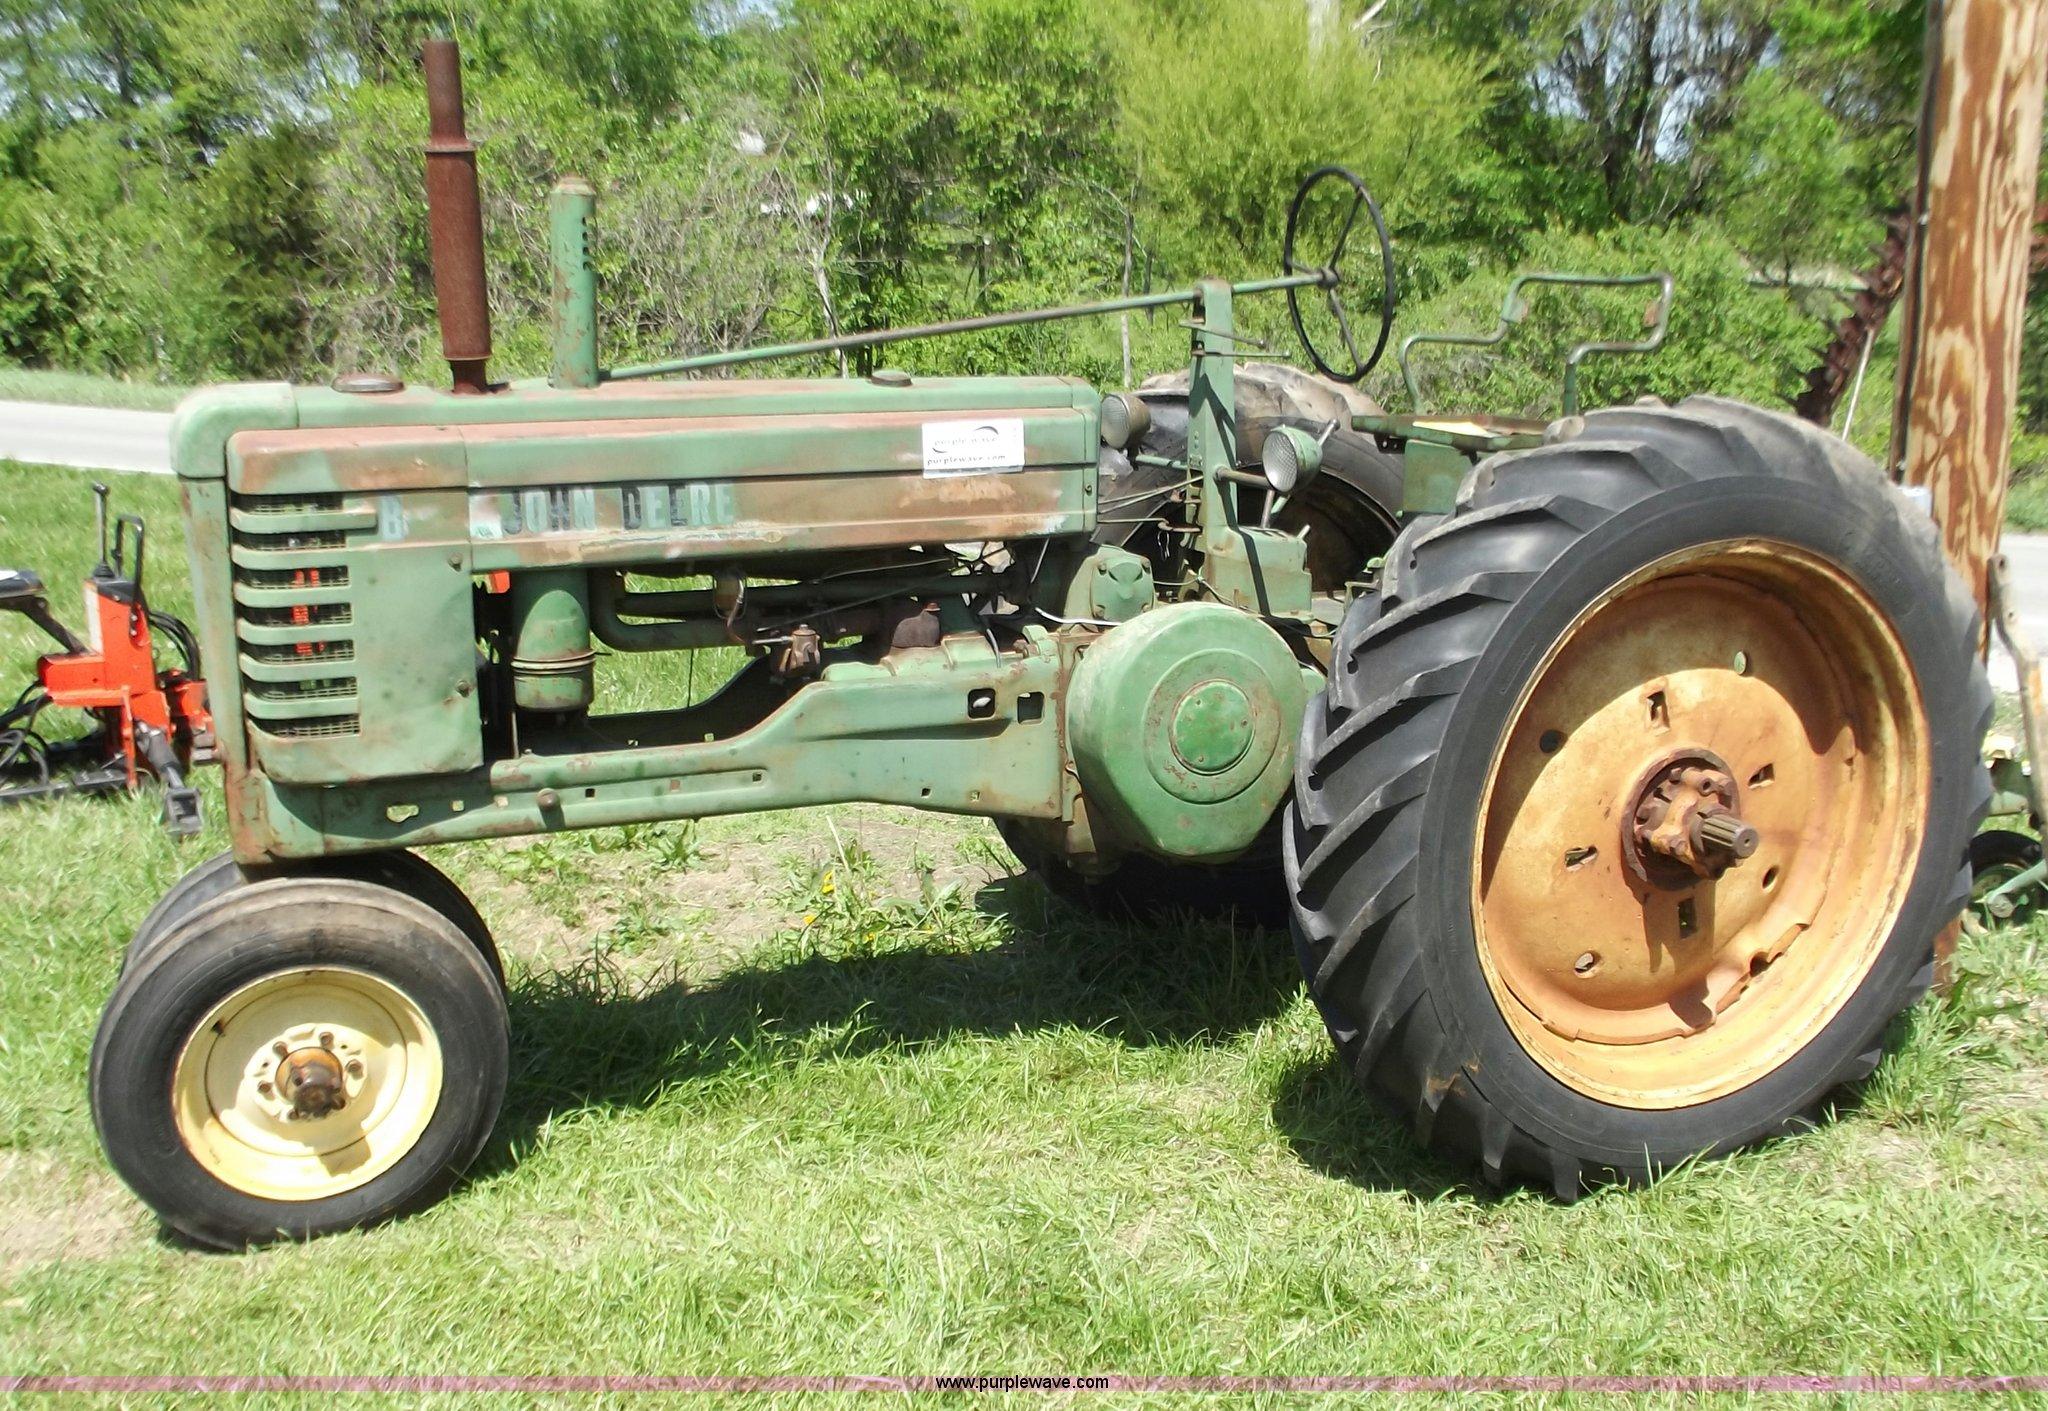 1950 john deere b tractor | item d4363 | sold! August 14 ant.